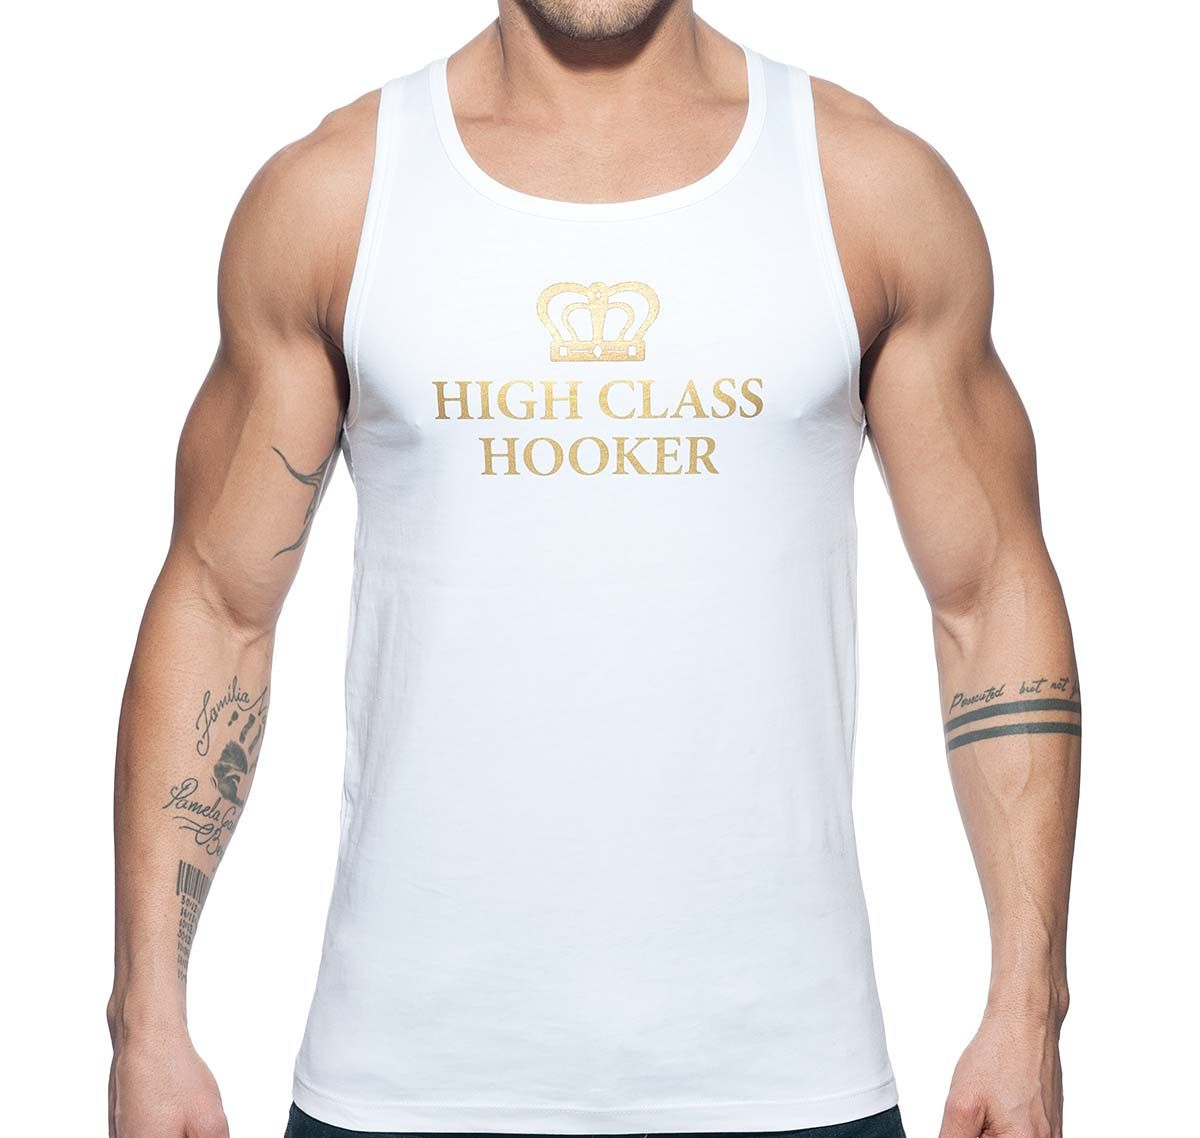 Addicted Tank Top HIGH CLASS HOOKER TANK TOP AD646, white